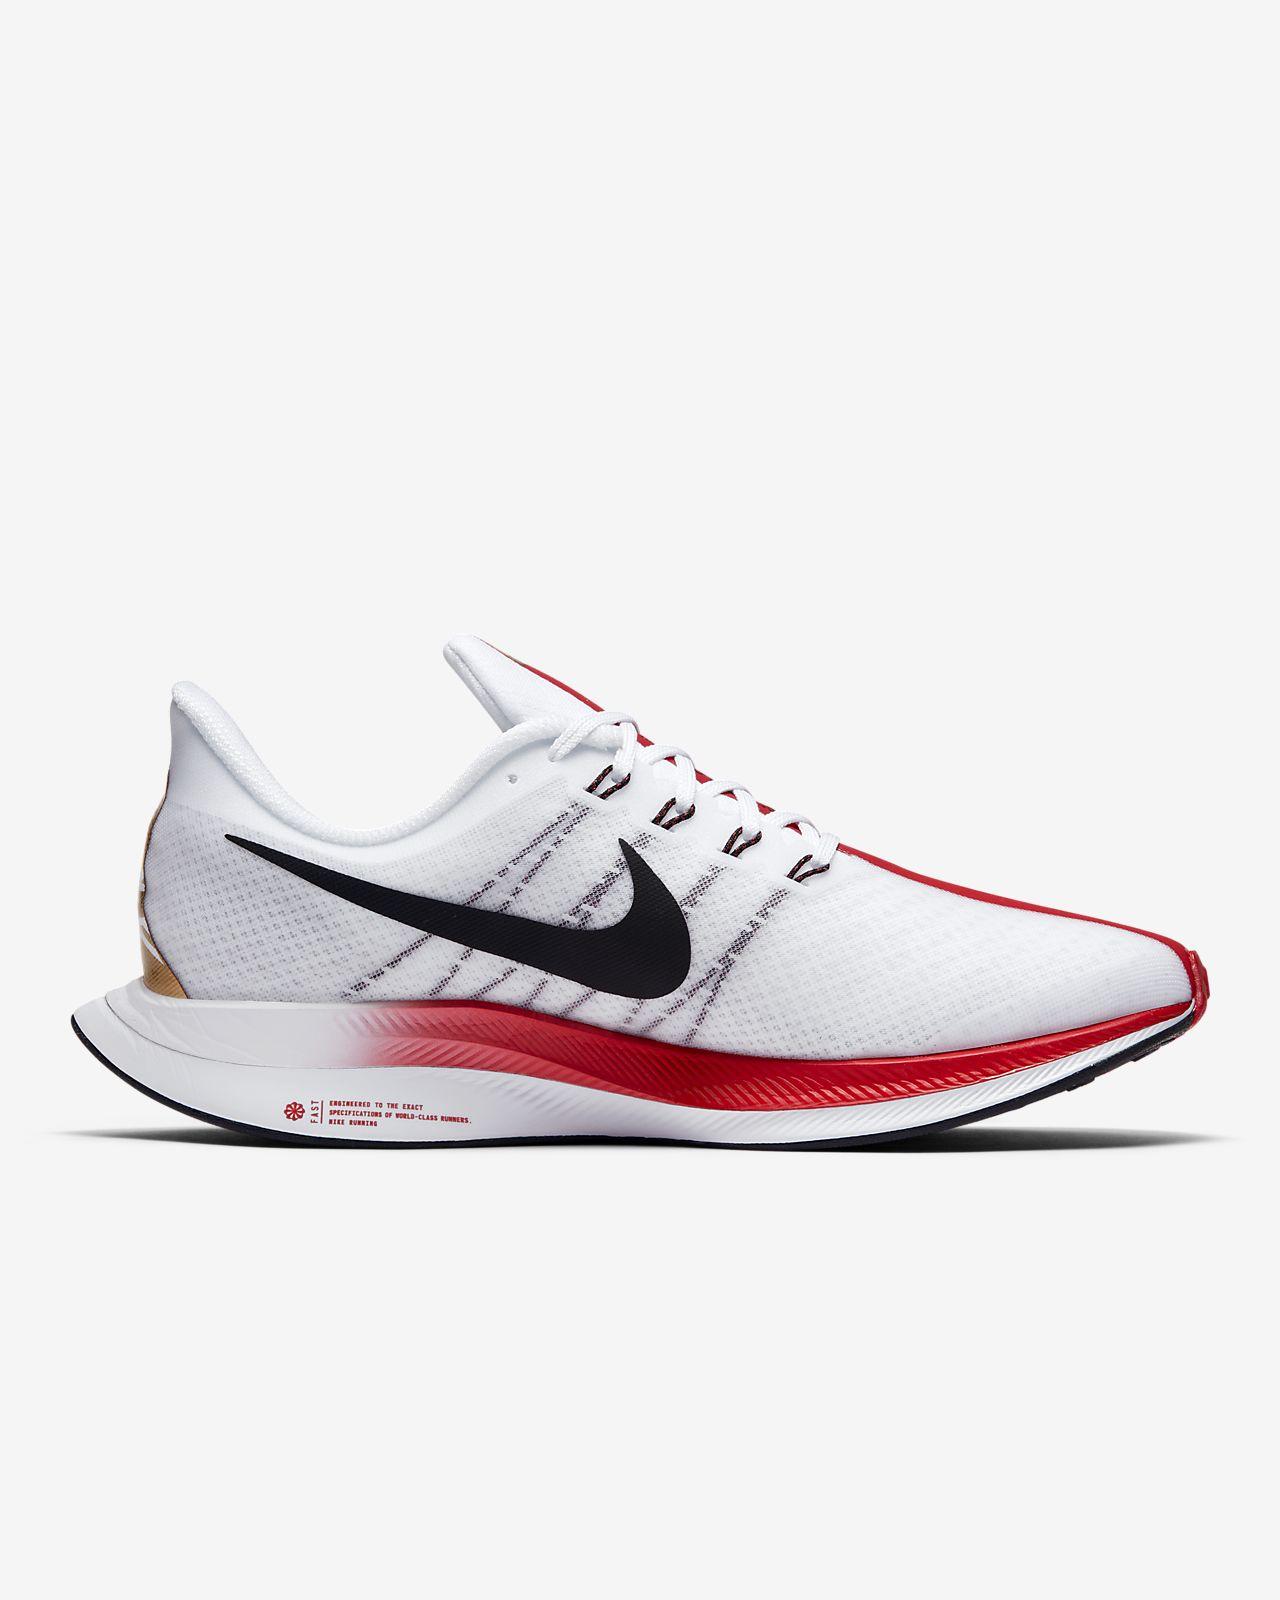 Chaussure de running Nike Zoom Pegasus 35 Turbo Mo